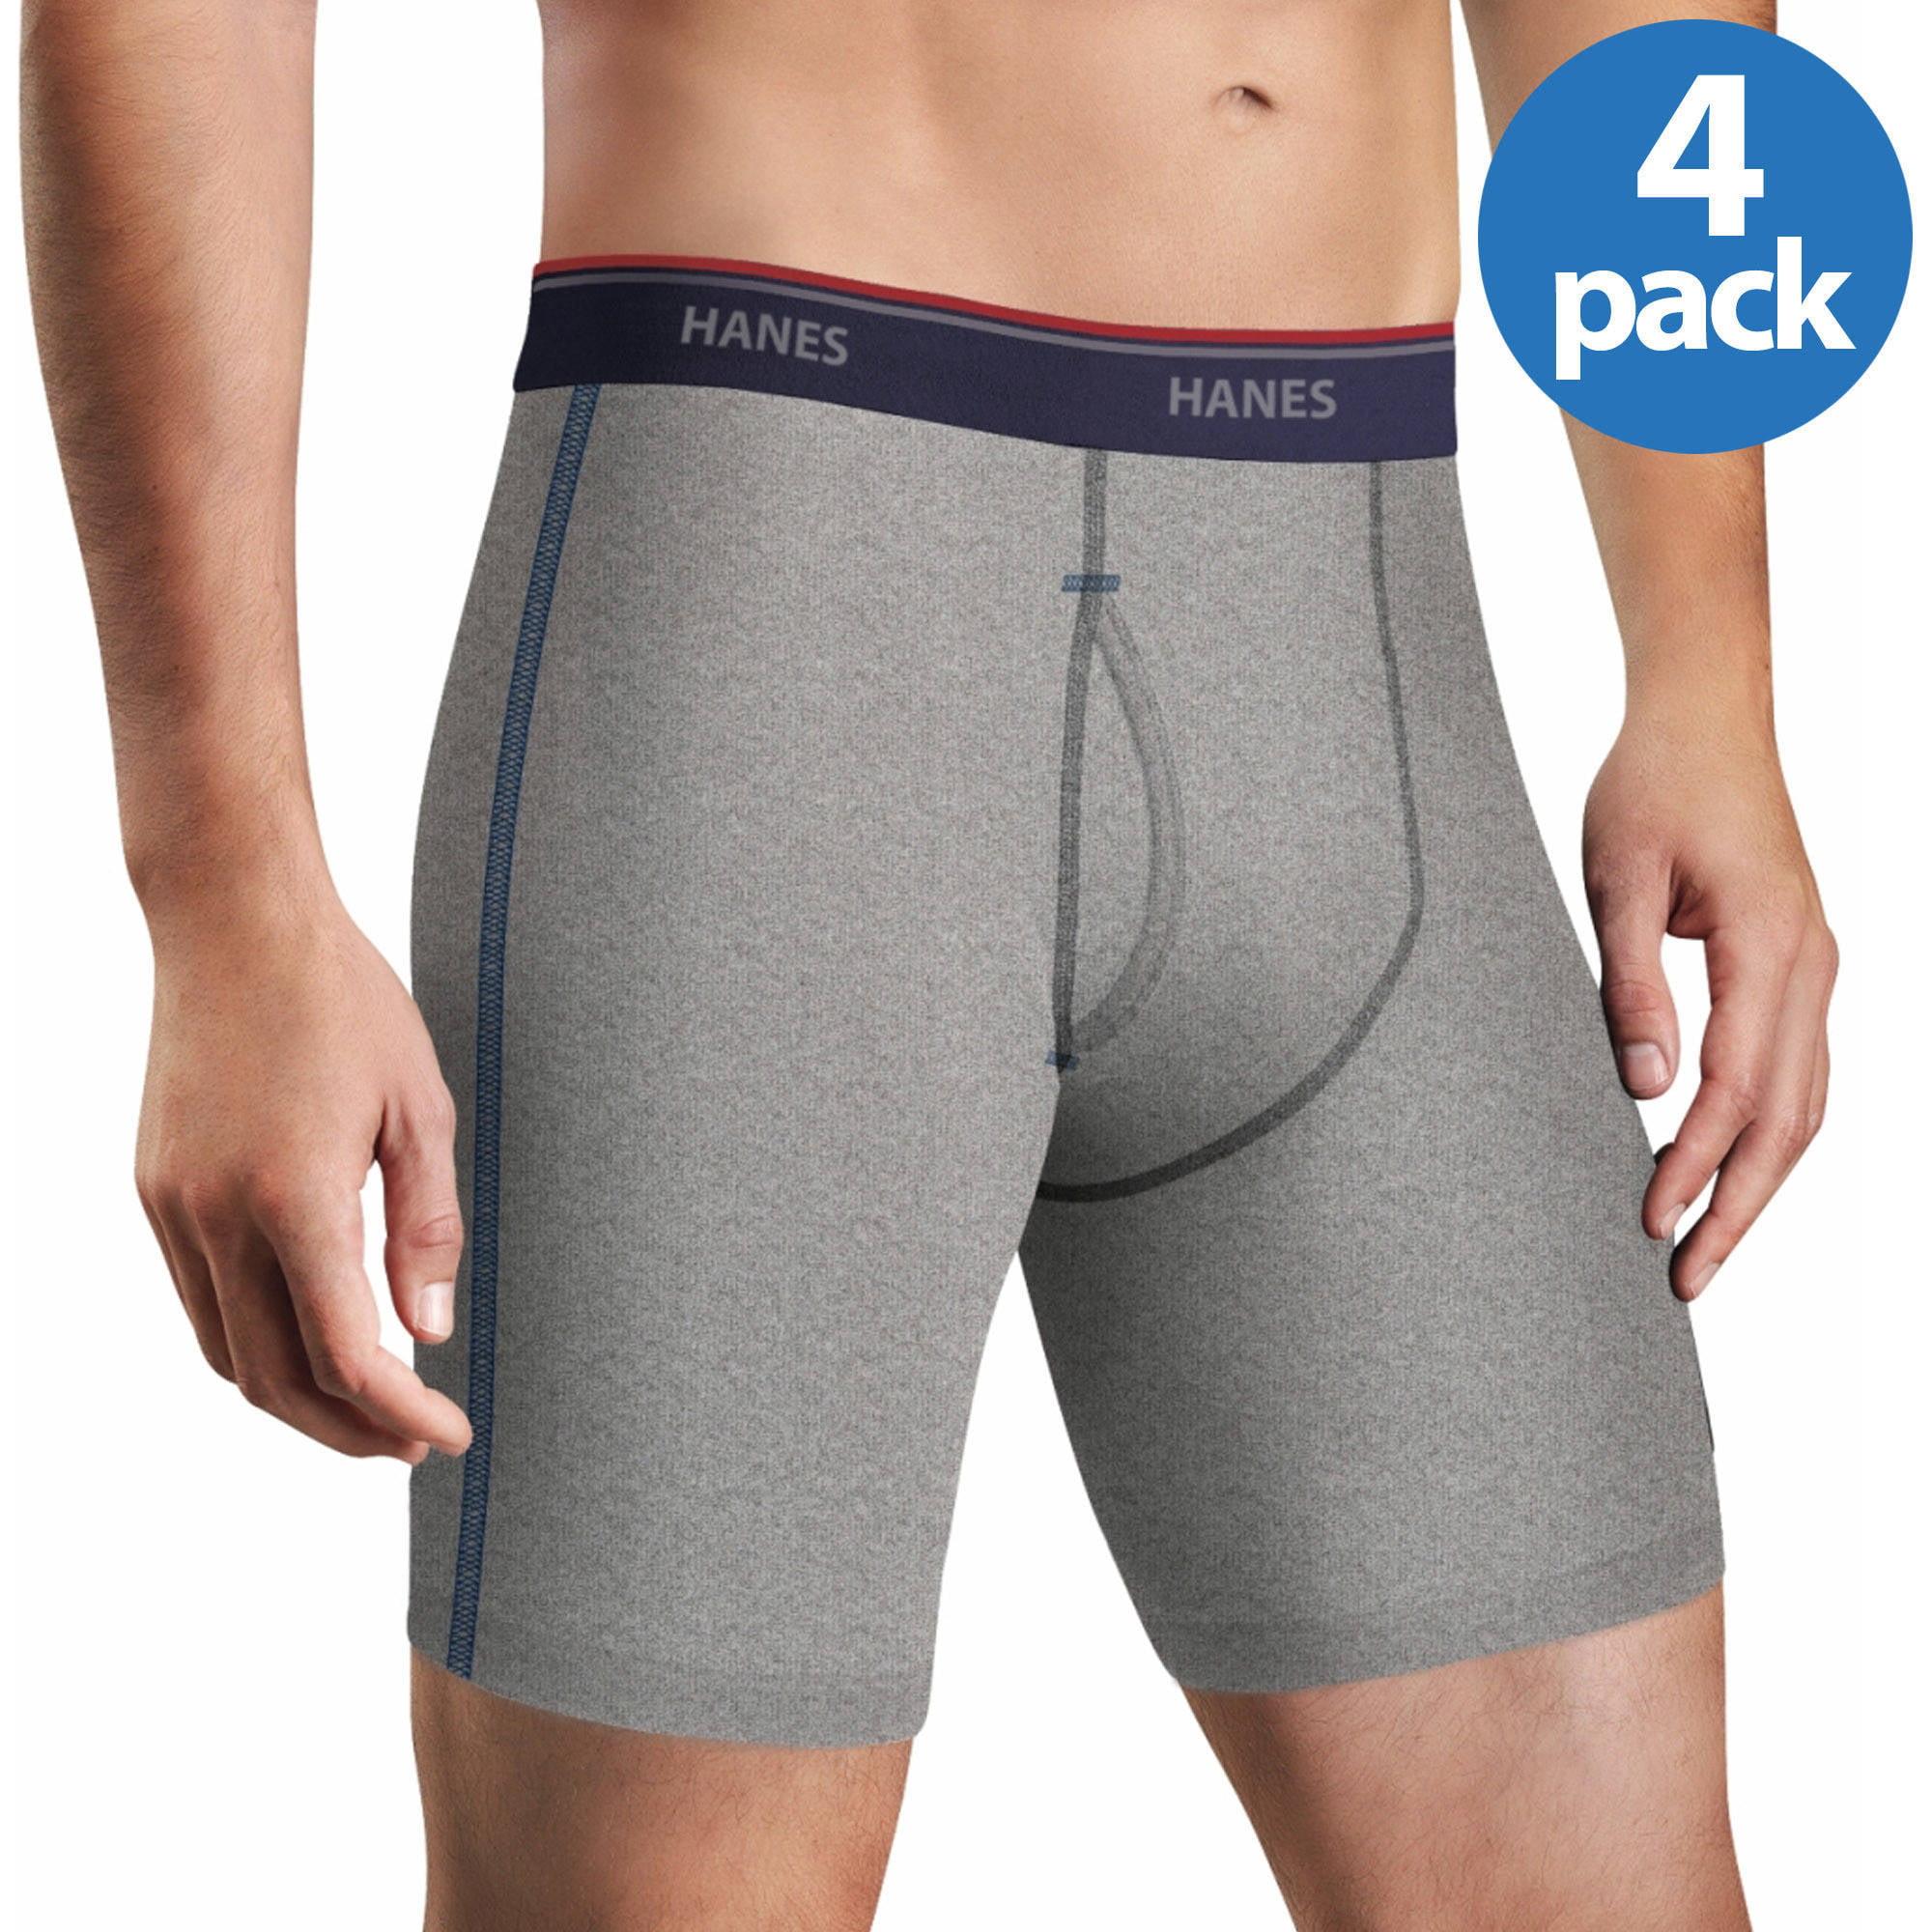 Hanes Big Men's FreshIQ Comfort Flex Waistband Long Leg Boxer Brief 4-Pack, size 2XL